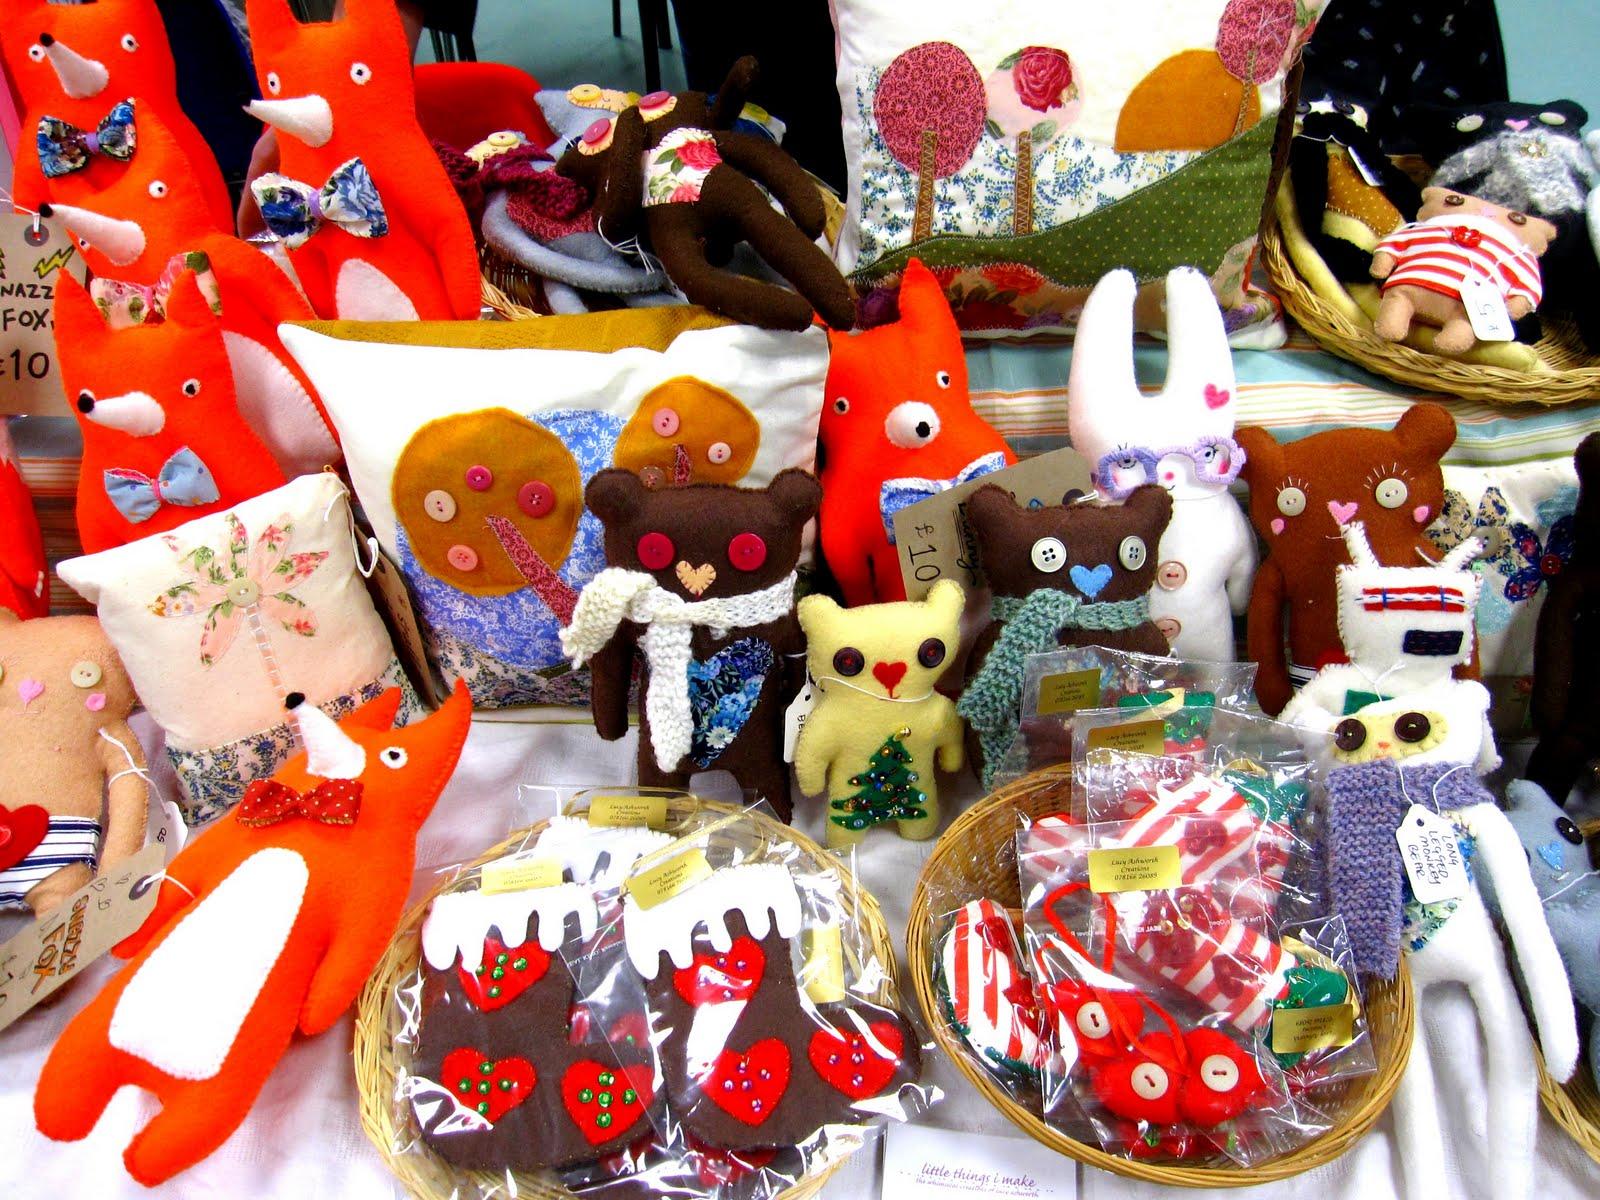 Little things i make christmas craft fair 2 for Things to make for christmas craft fairs